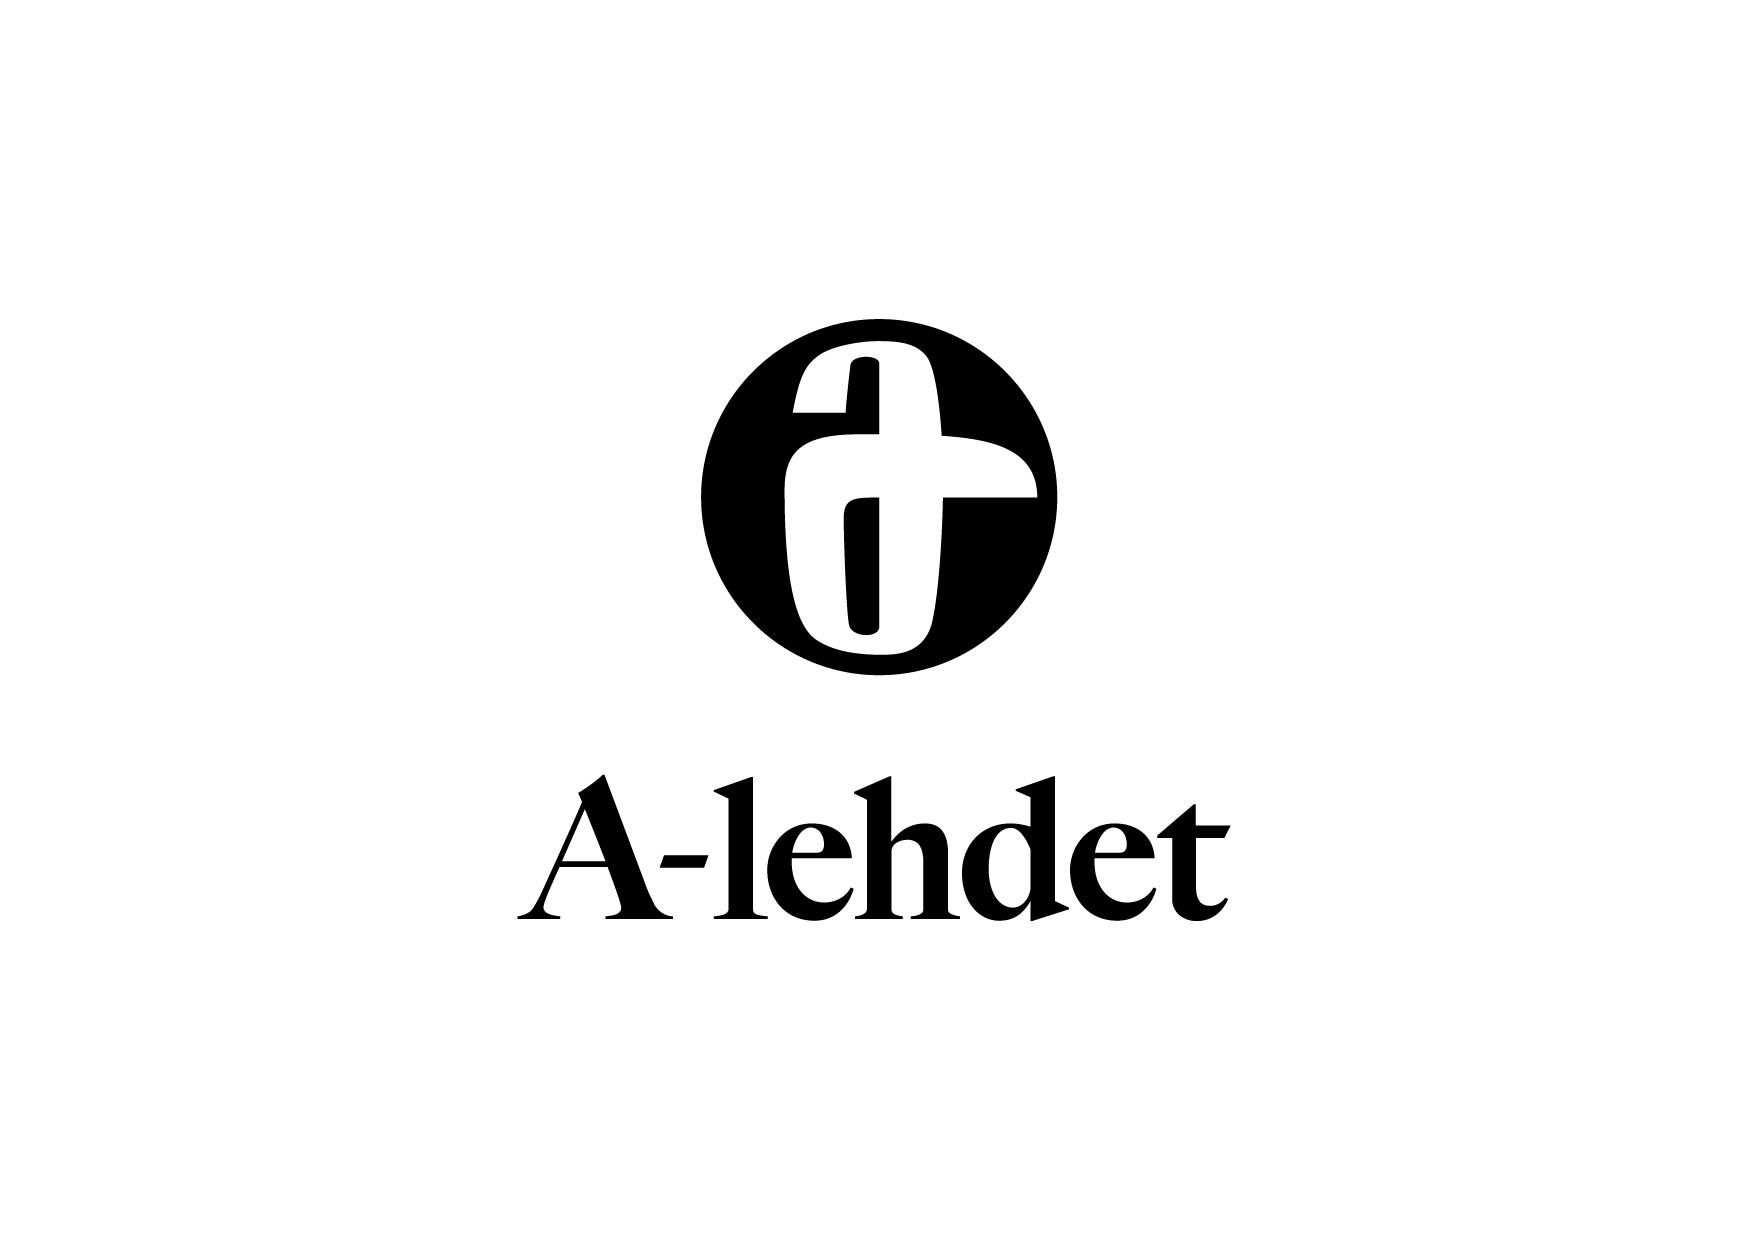 a-lehdet_logo_vertical_black.jpg (779 KB)